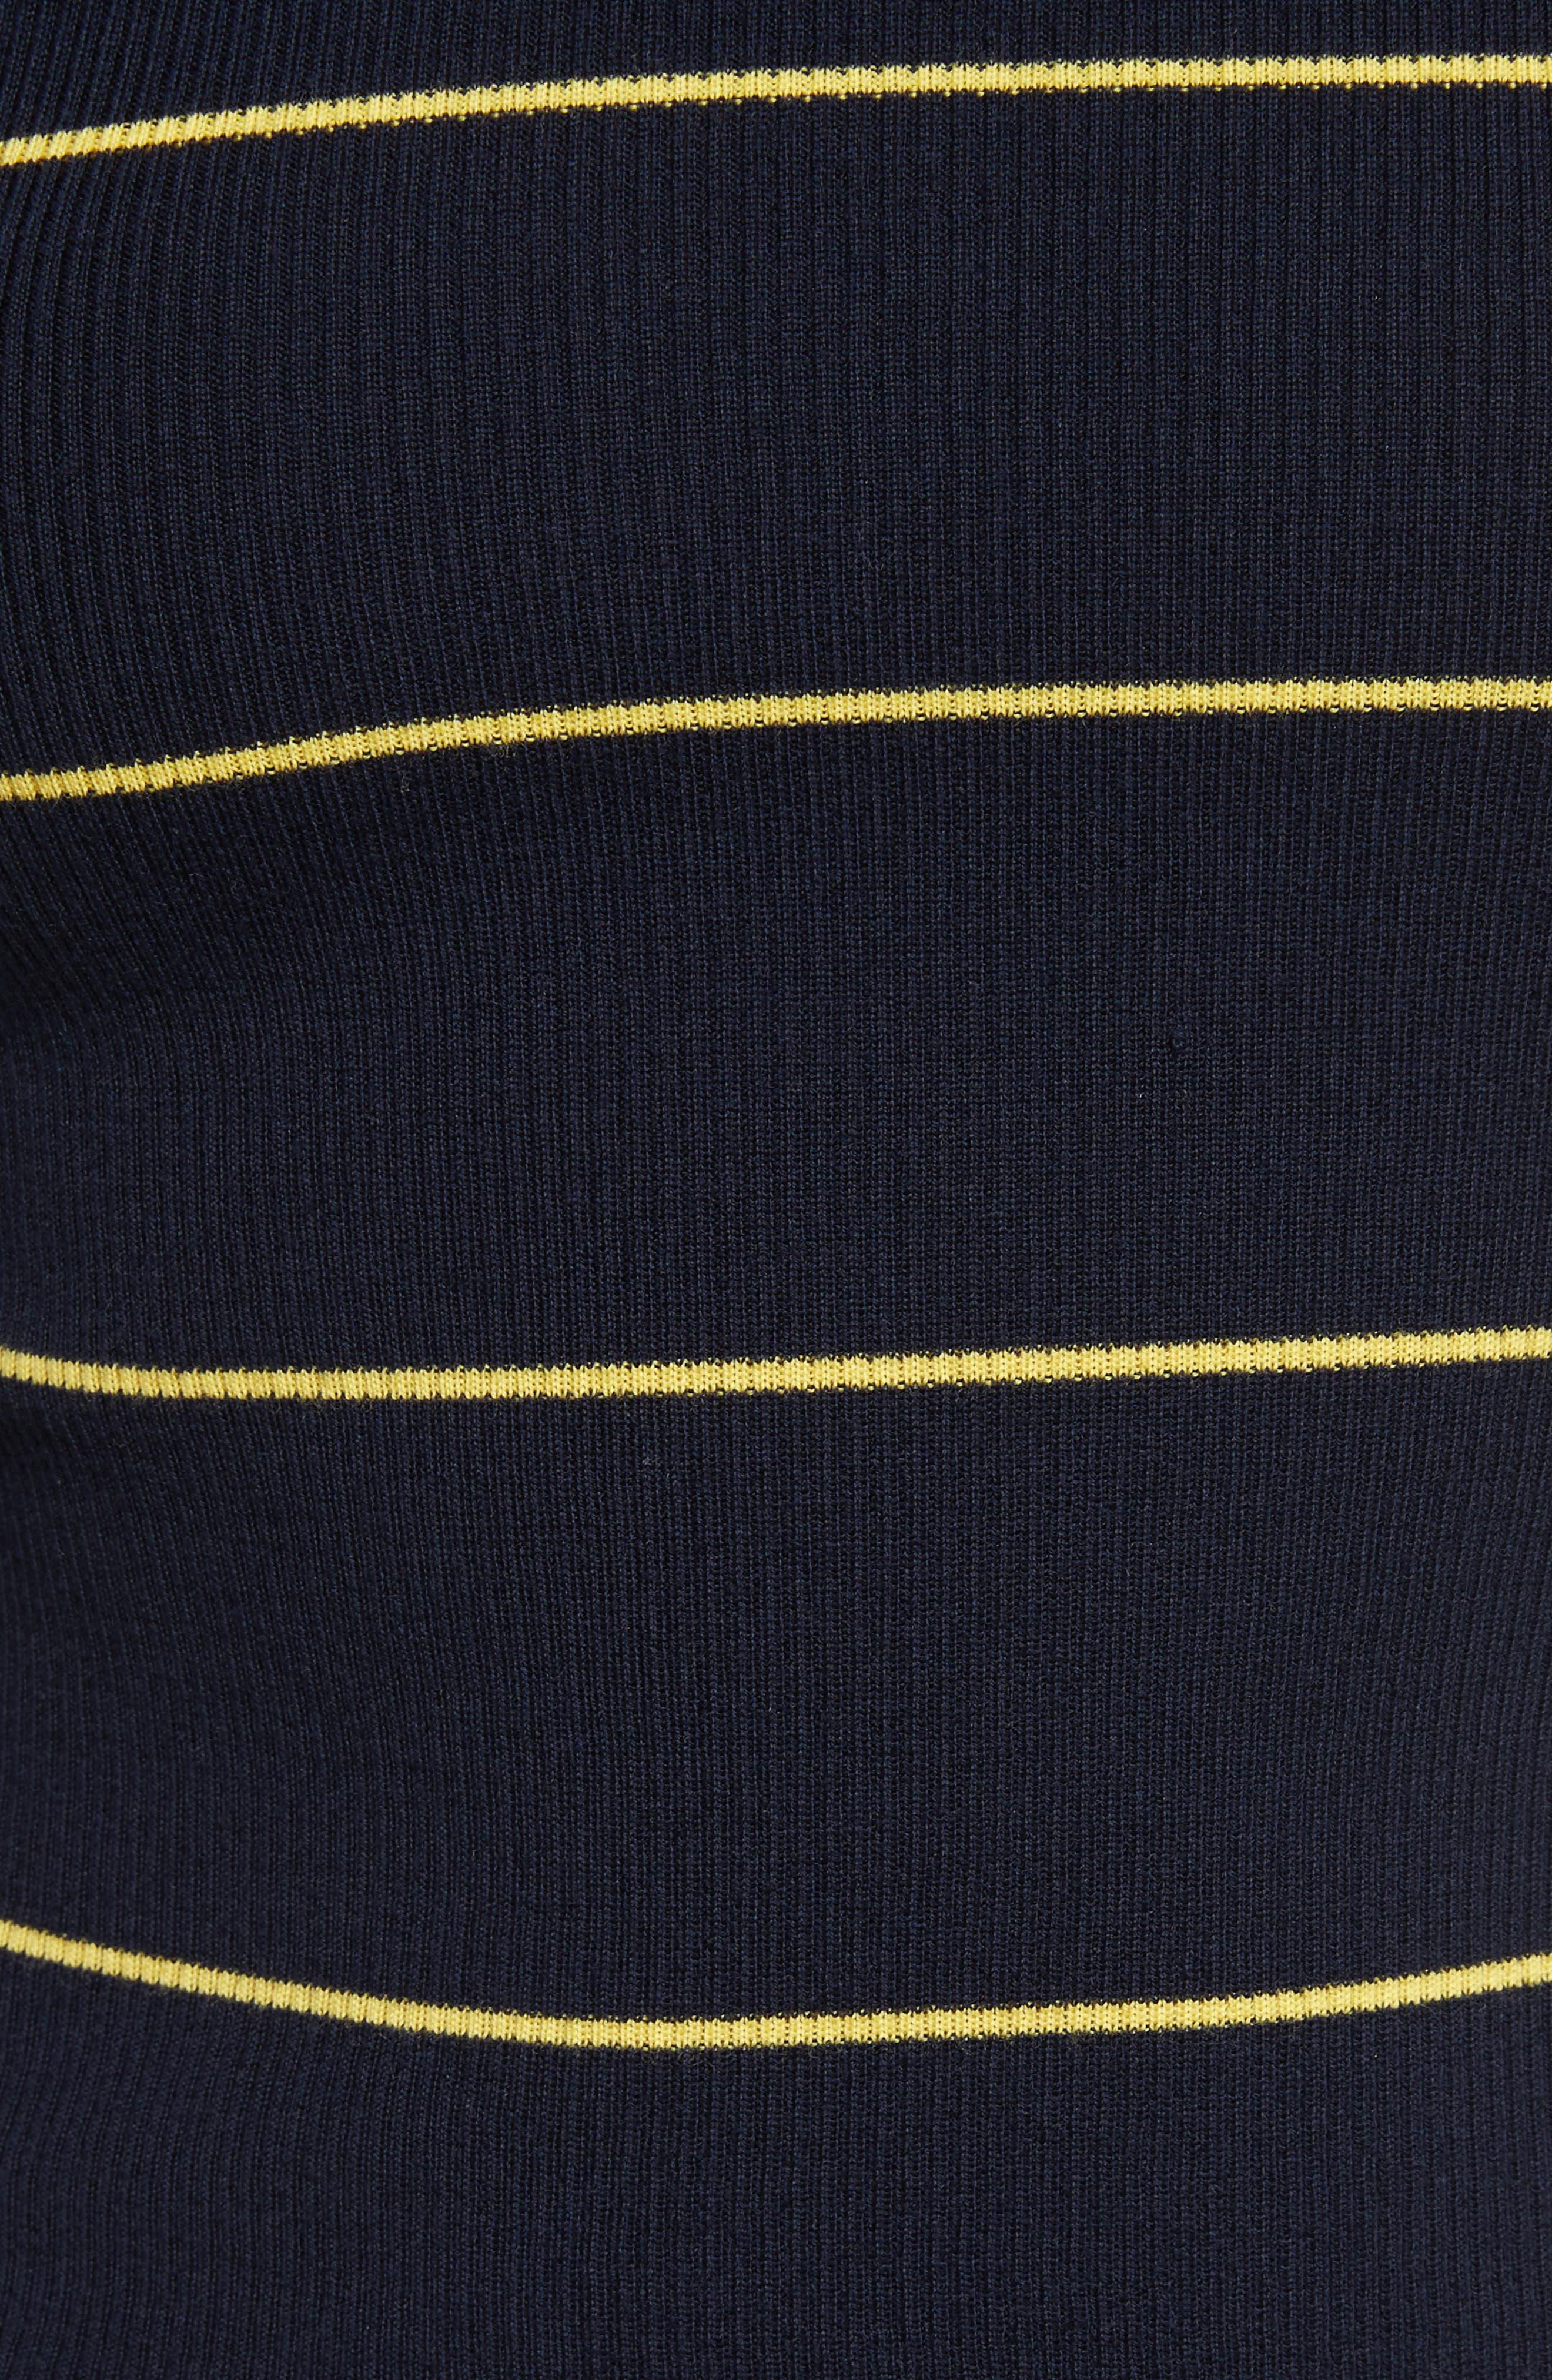 Stripe Crop Turtleneck,                             Alternate thumbnail 9, color,